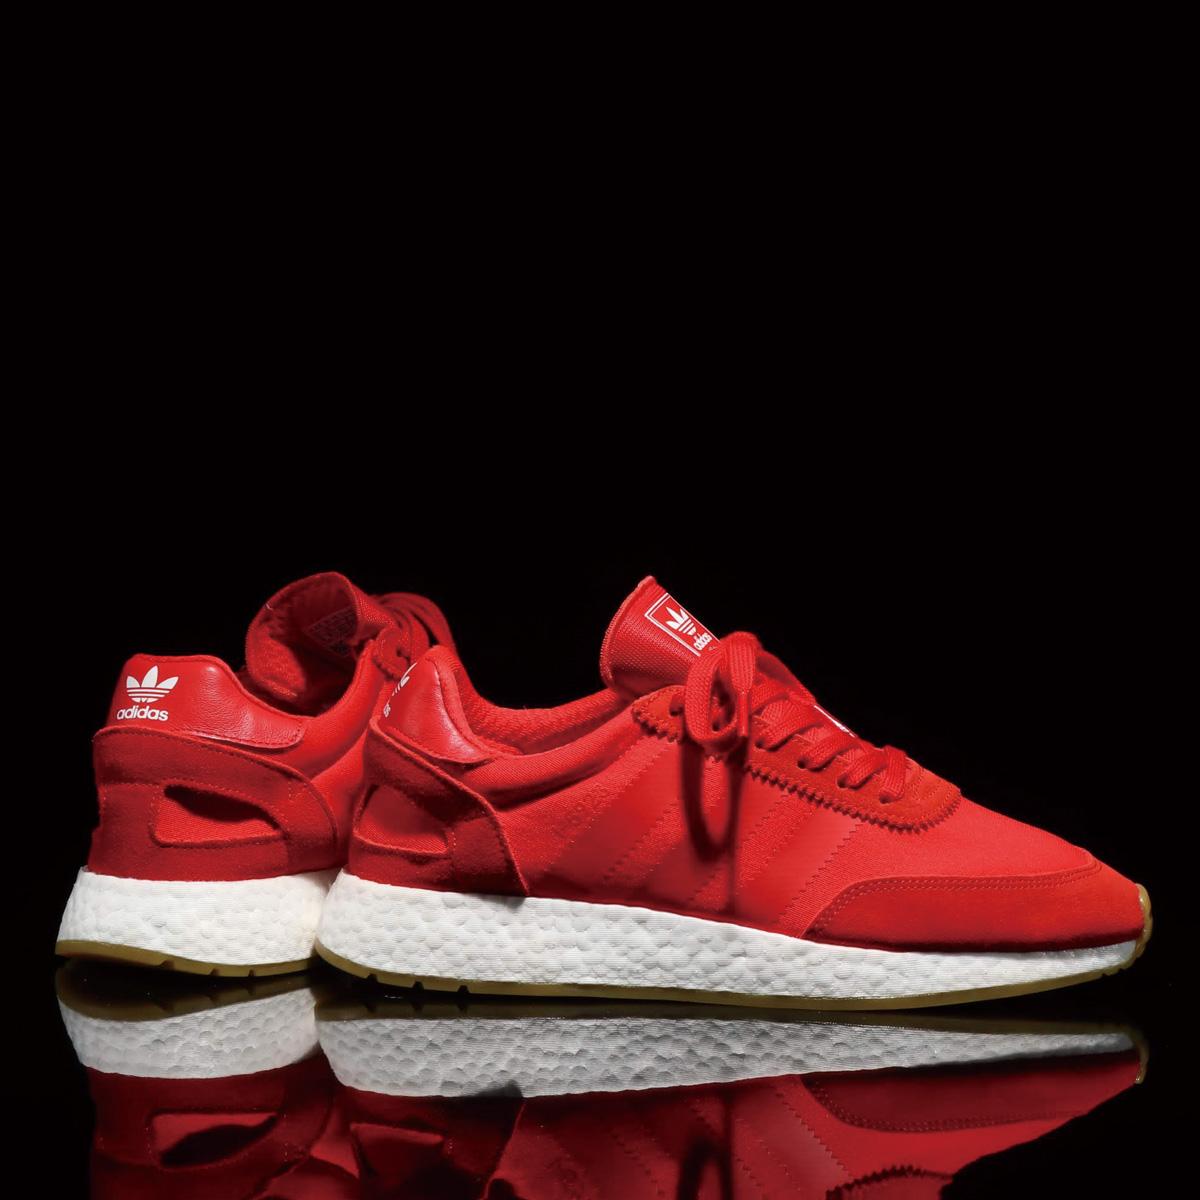 adidas Originals I-5923(アディダス オリジナルス I-5923)RED/RED/GUM【メンズ スニーカー】18FW-I